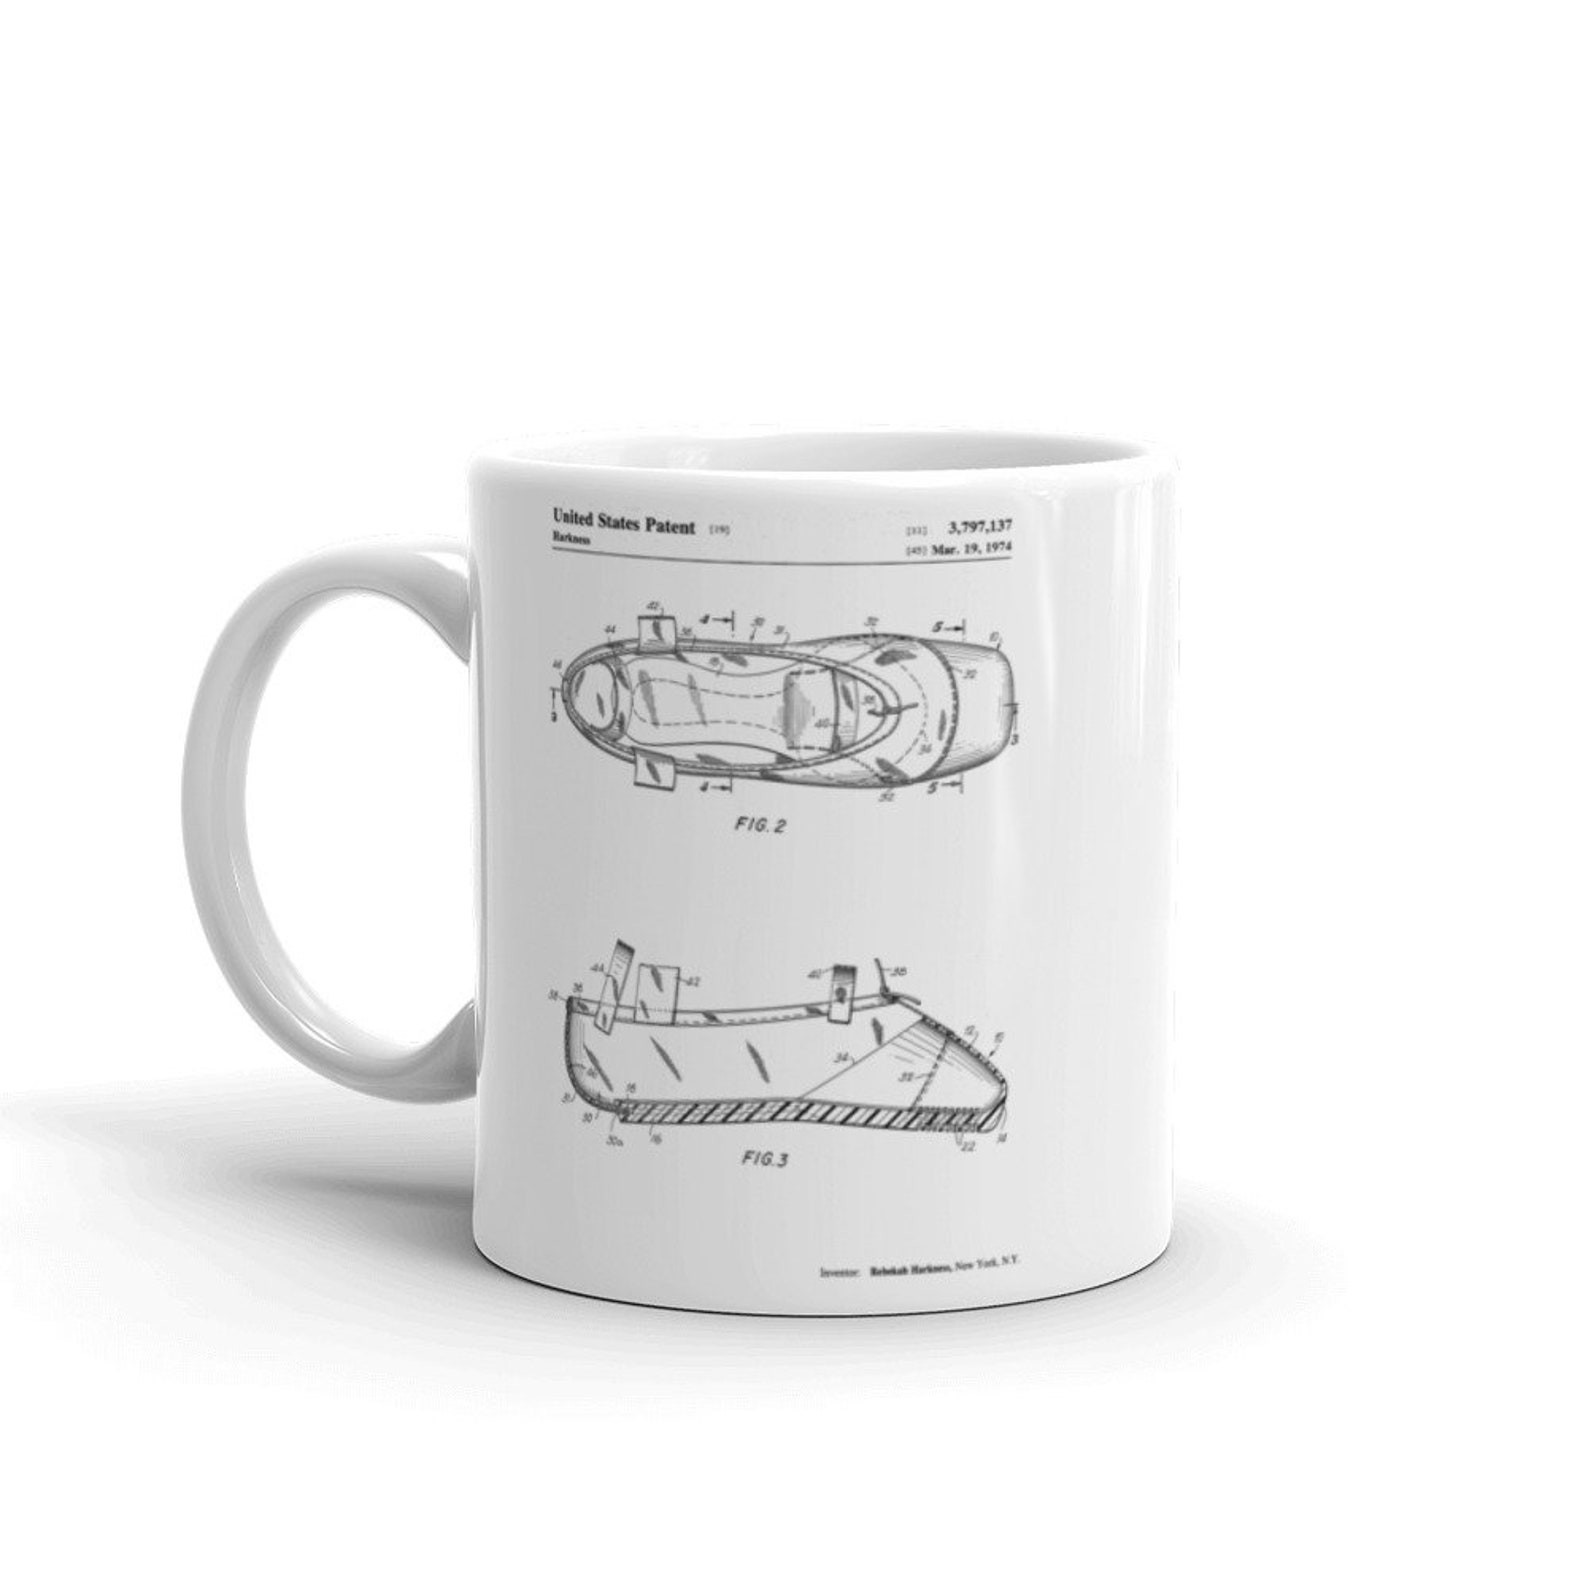 ballet slipper patent mug, ballerina gift, dance studio, ballet shoe, ballerina mug, unique gift idea